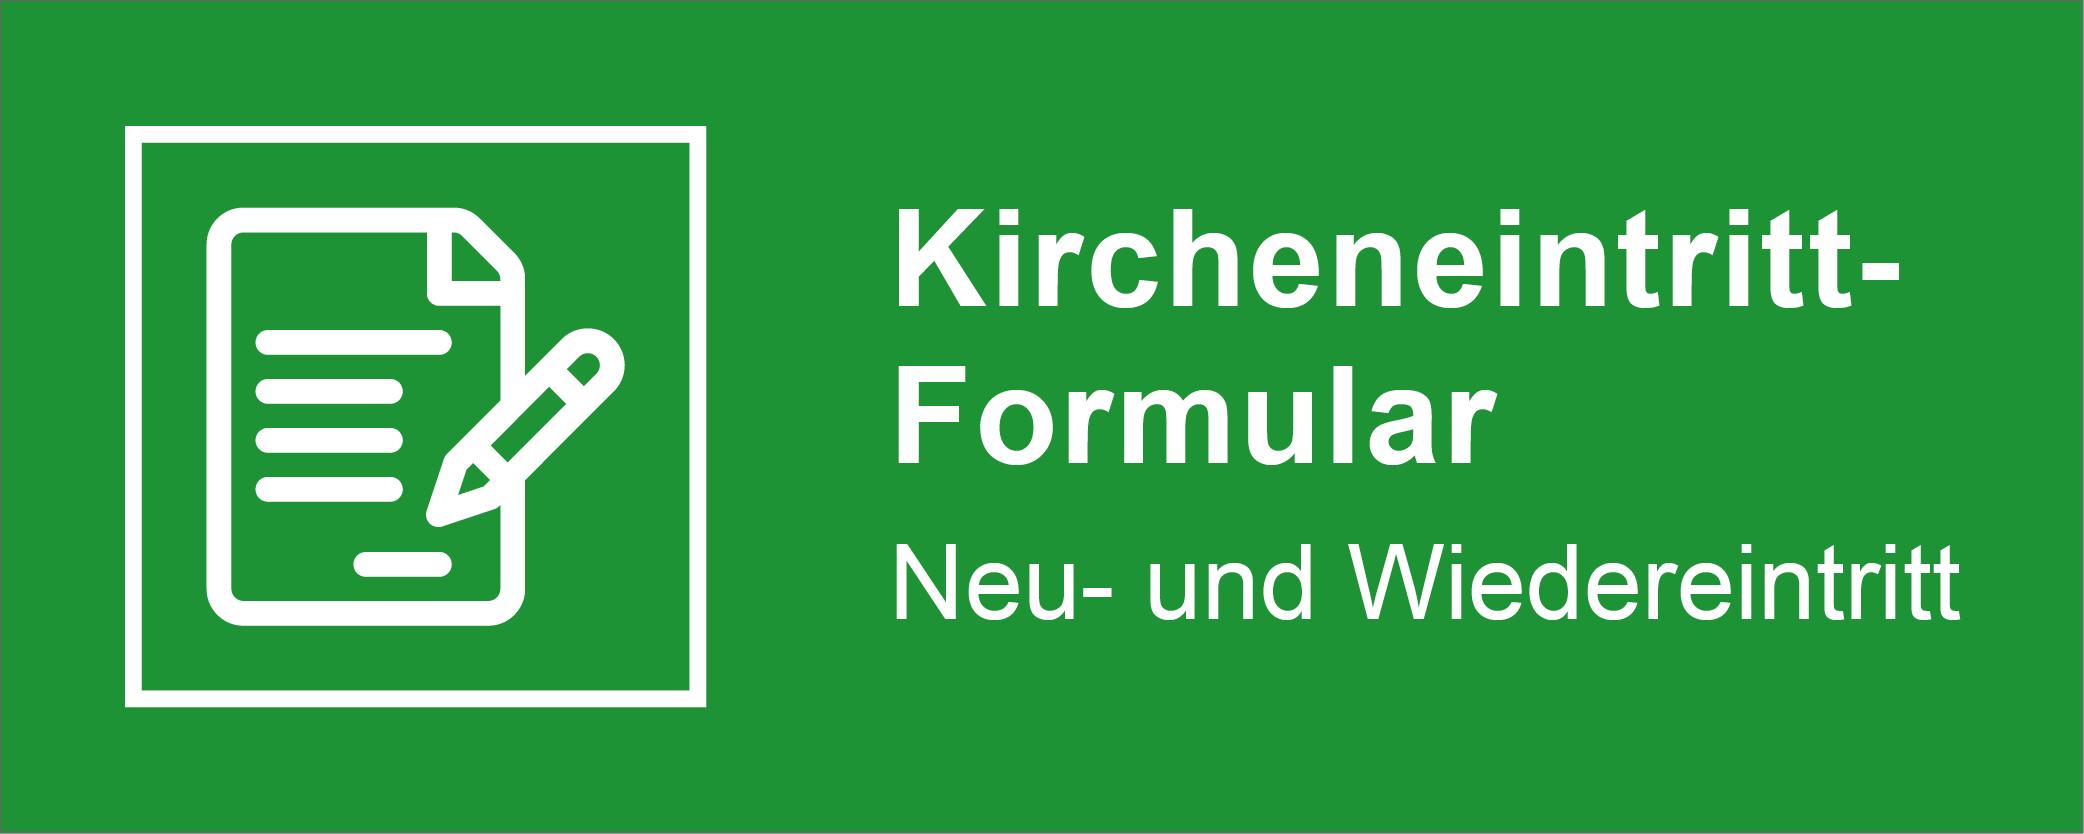 Kircheneintritt-Formular